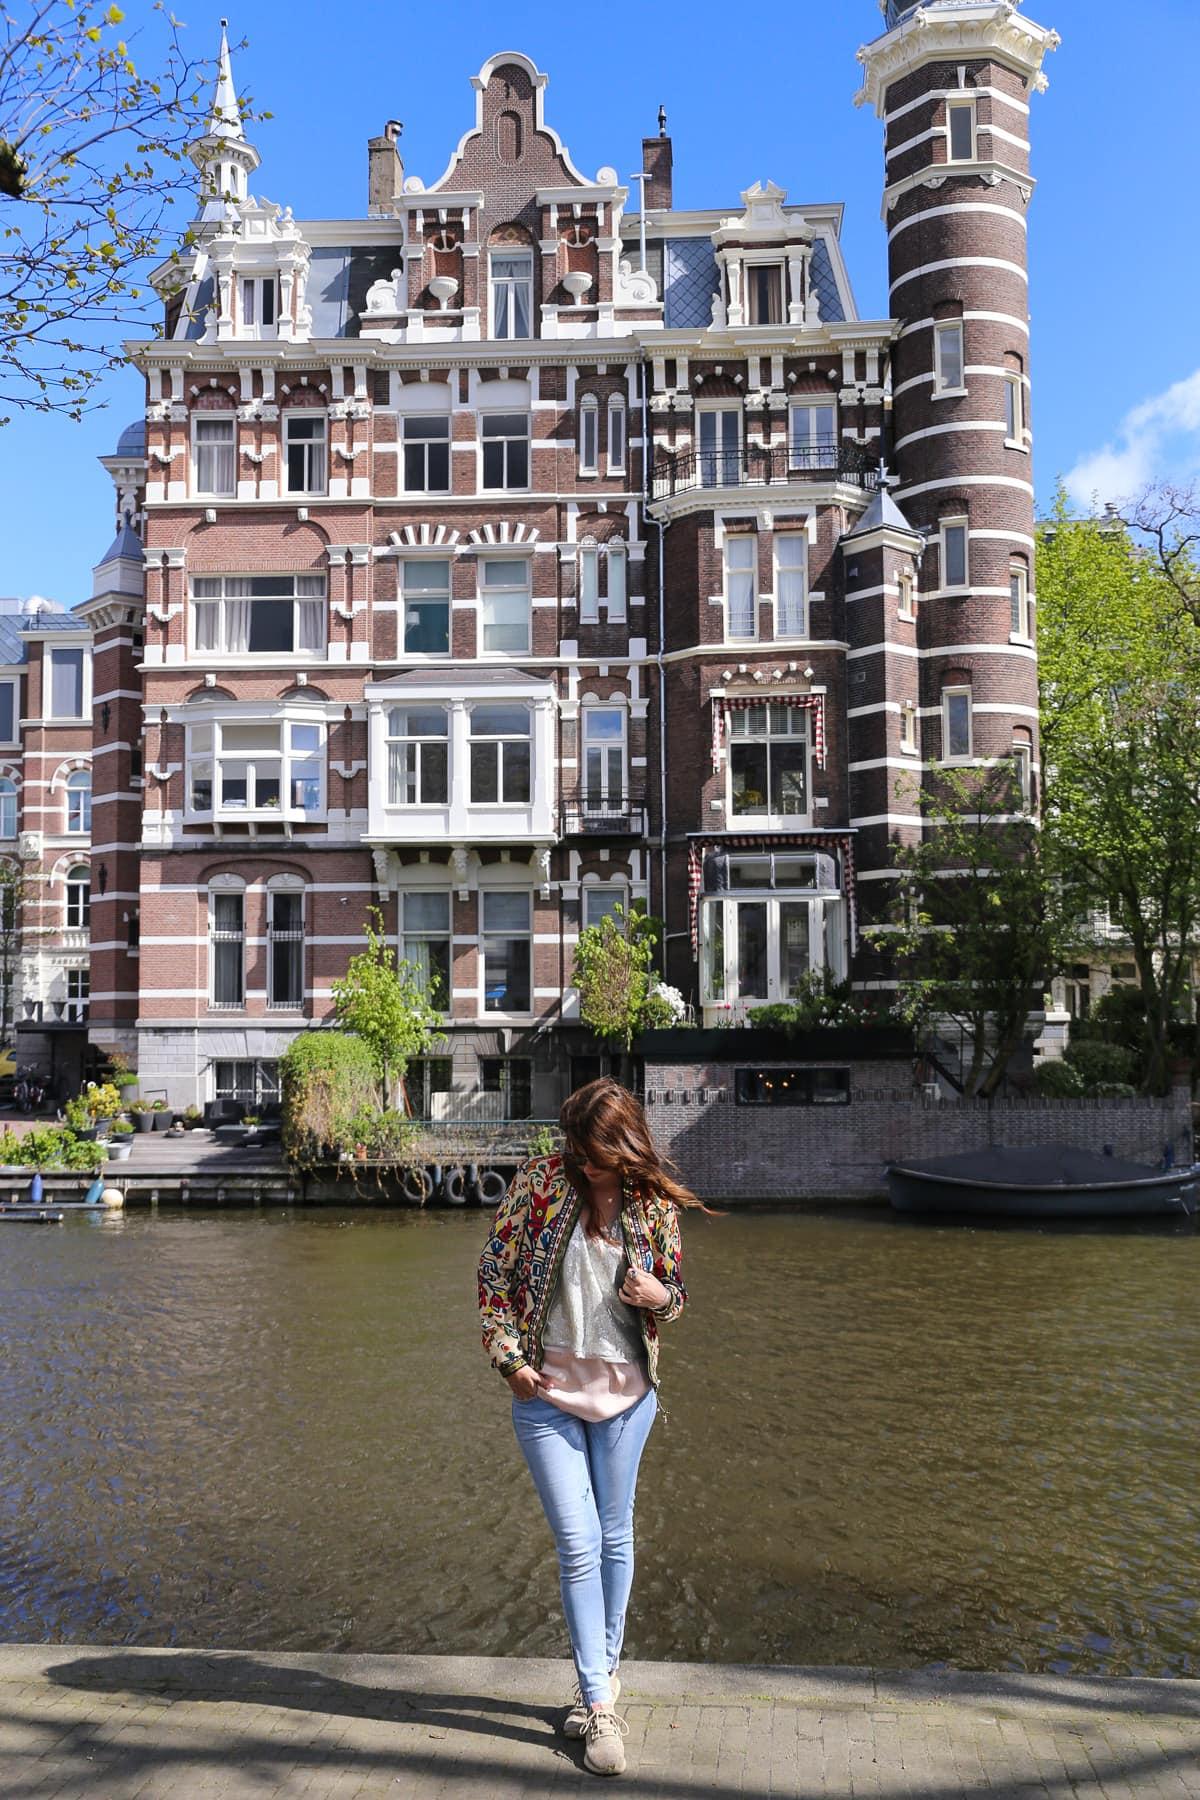 Sightseeing in Amsterdam - Adidas Tubular Shadow